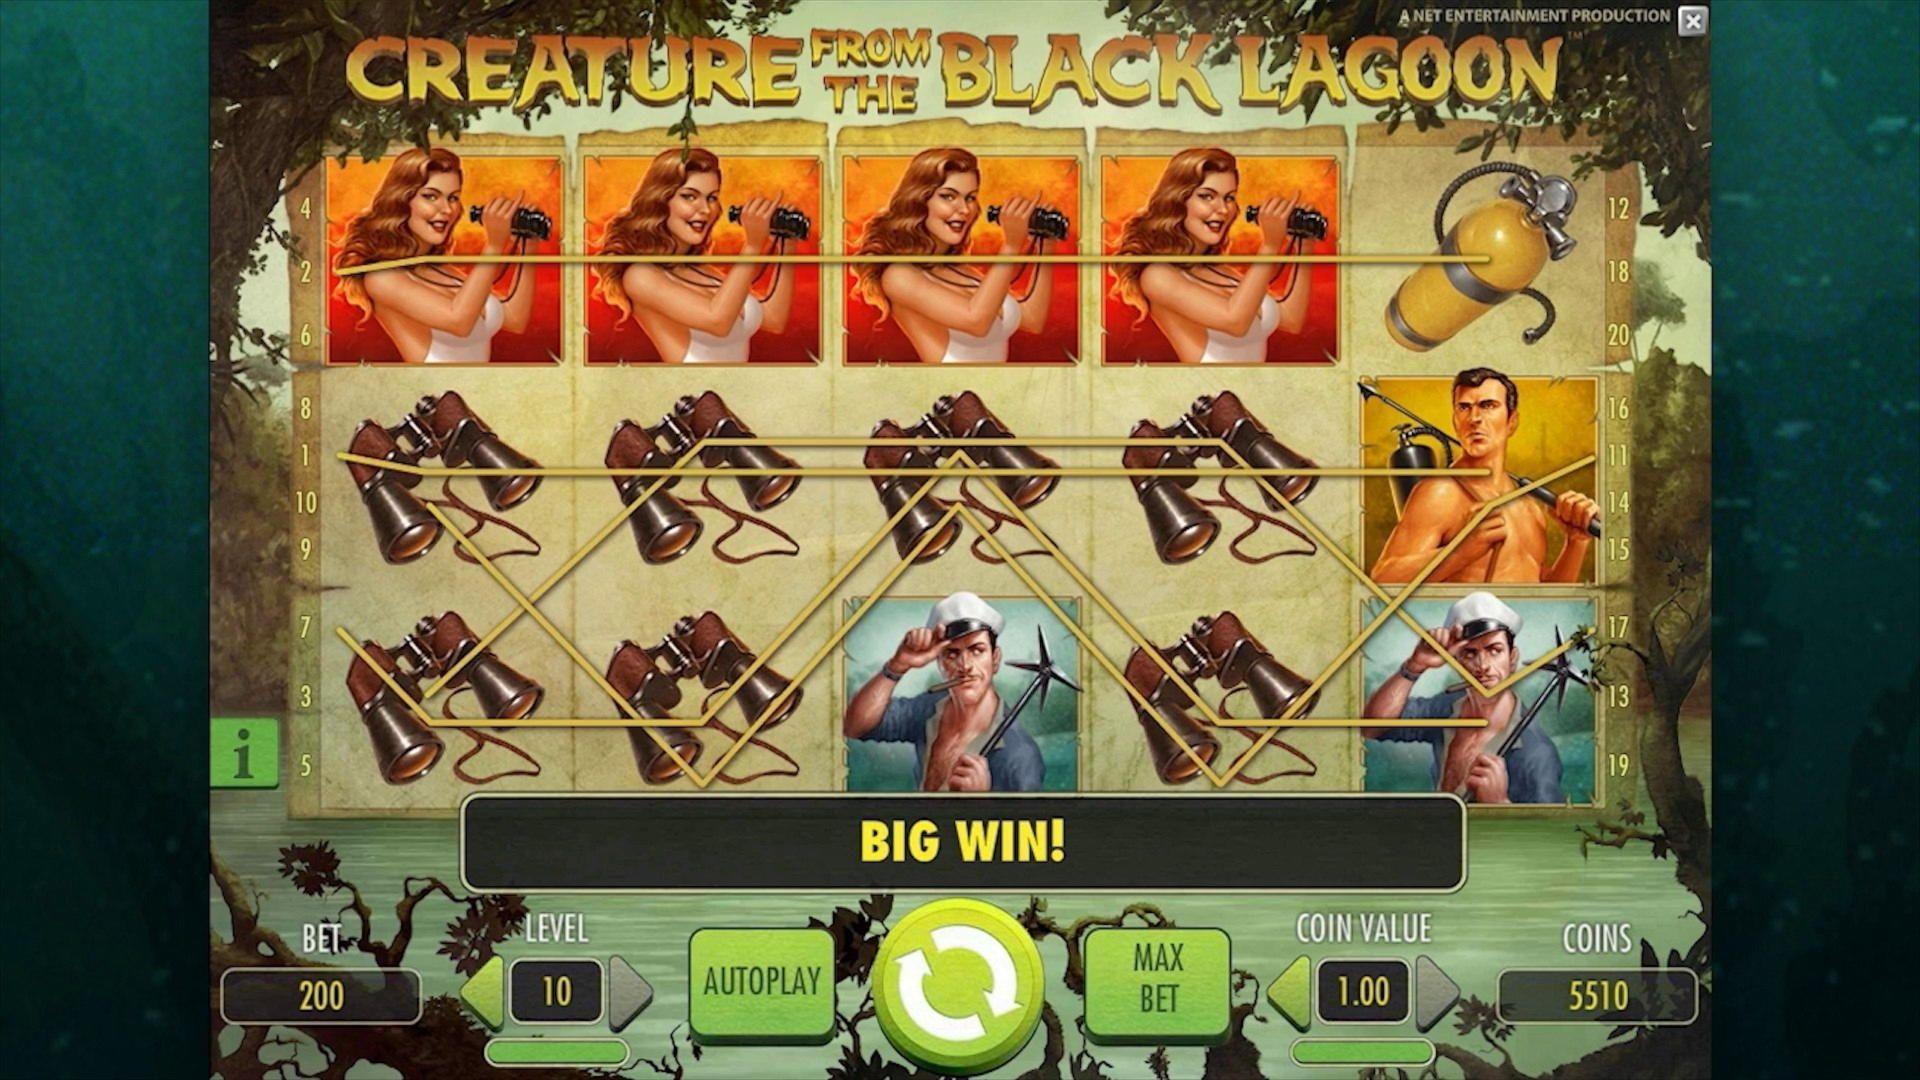 free spins casino australia